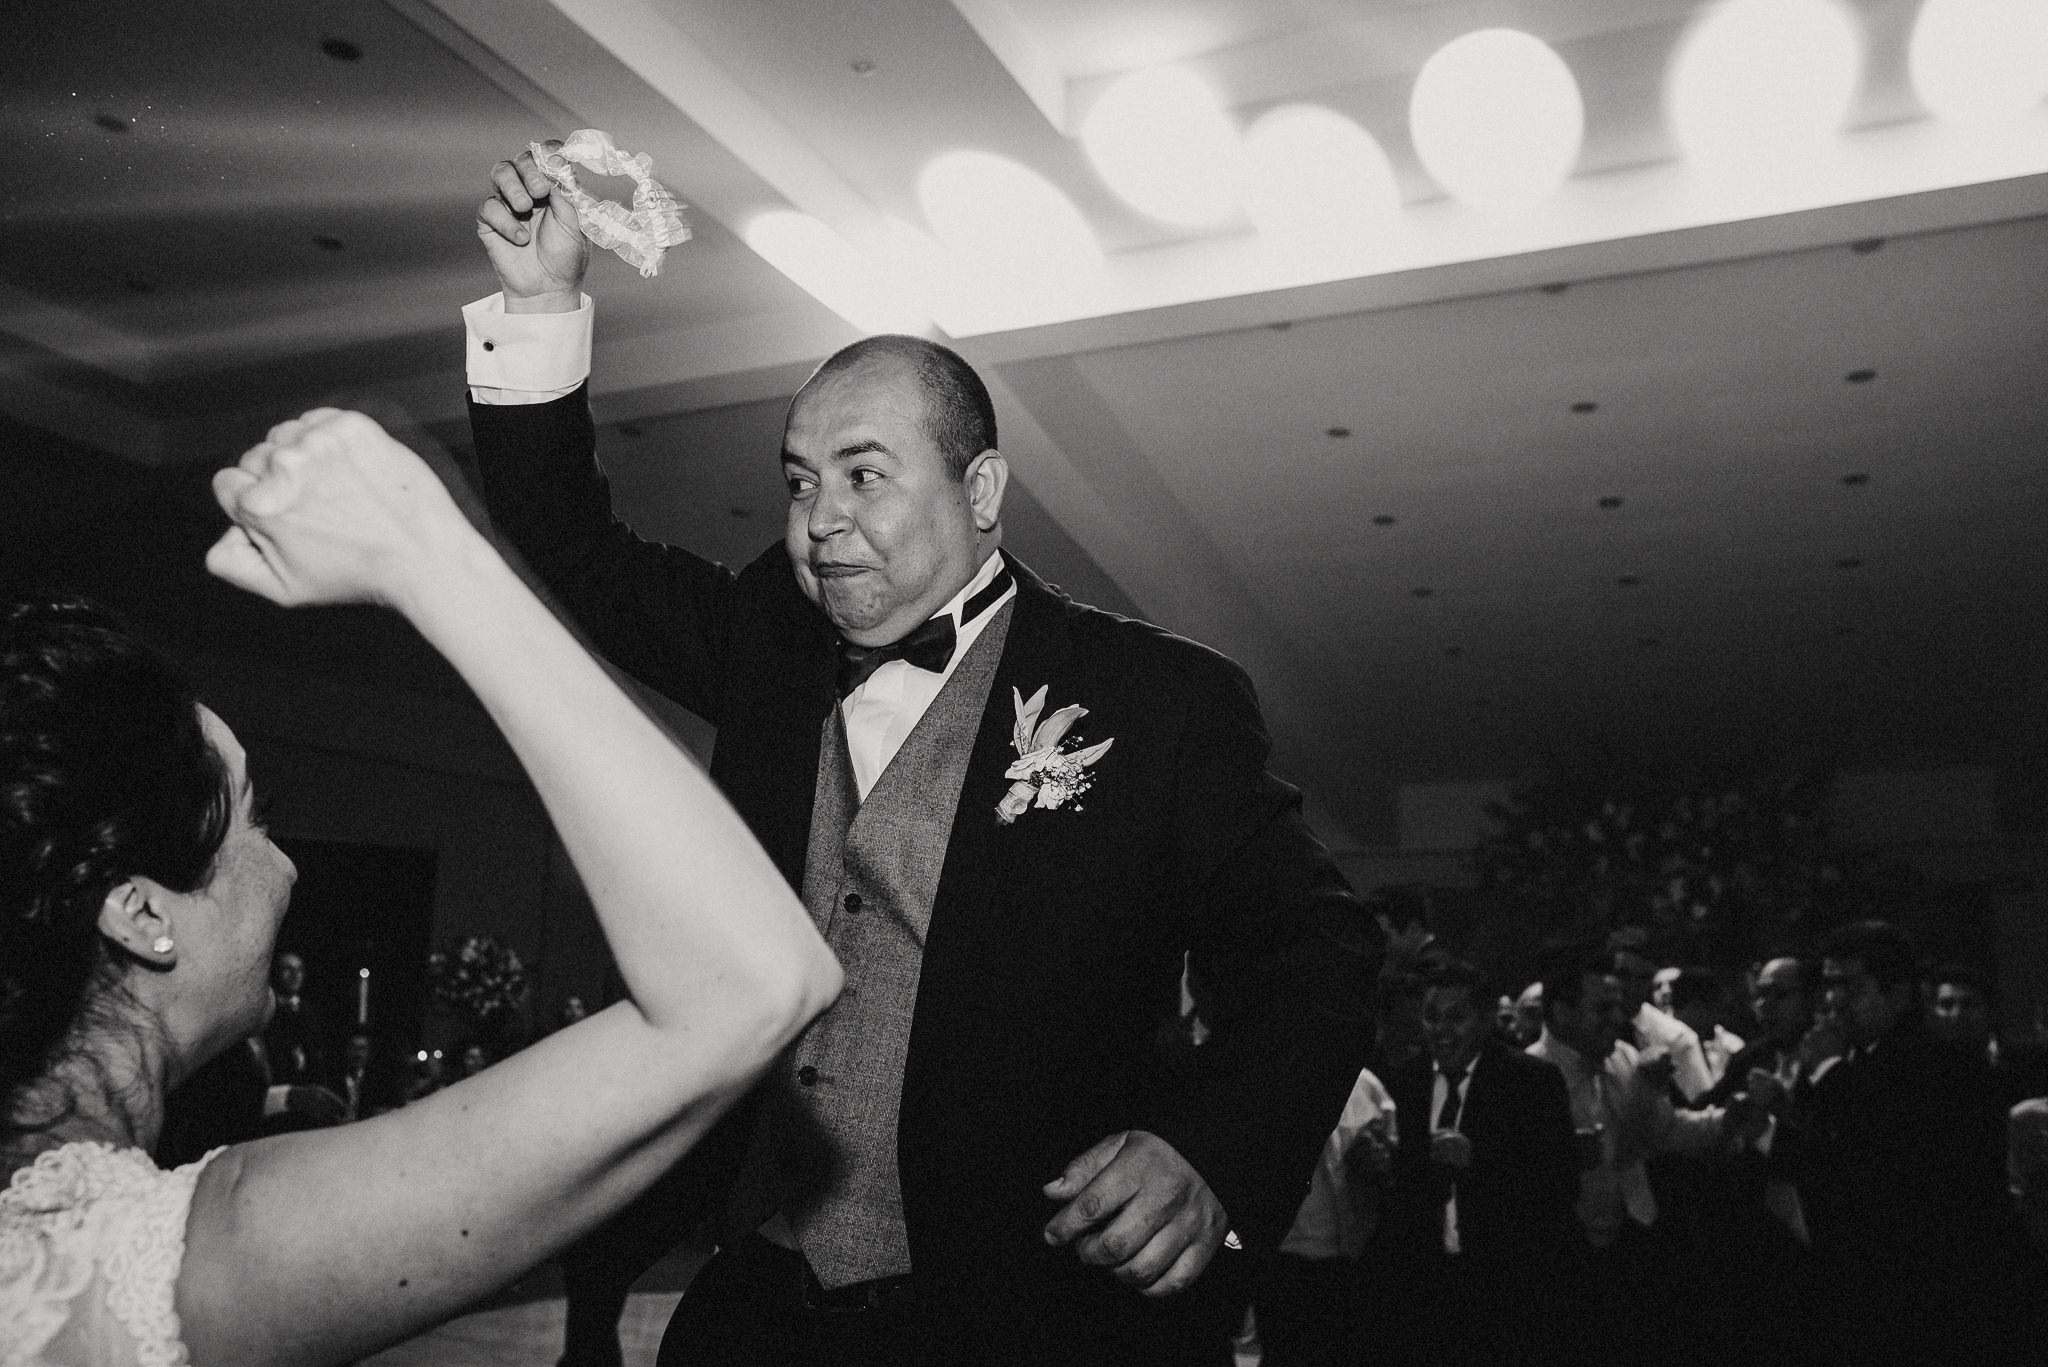 Wedding-Boda-Tulancingo-Hidalgo-Salon-Essenzia-Luis-Houdin-72-film